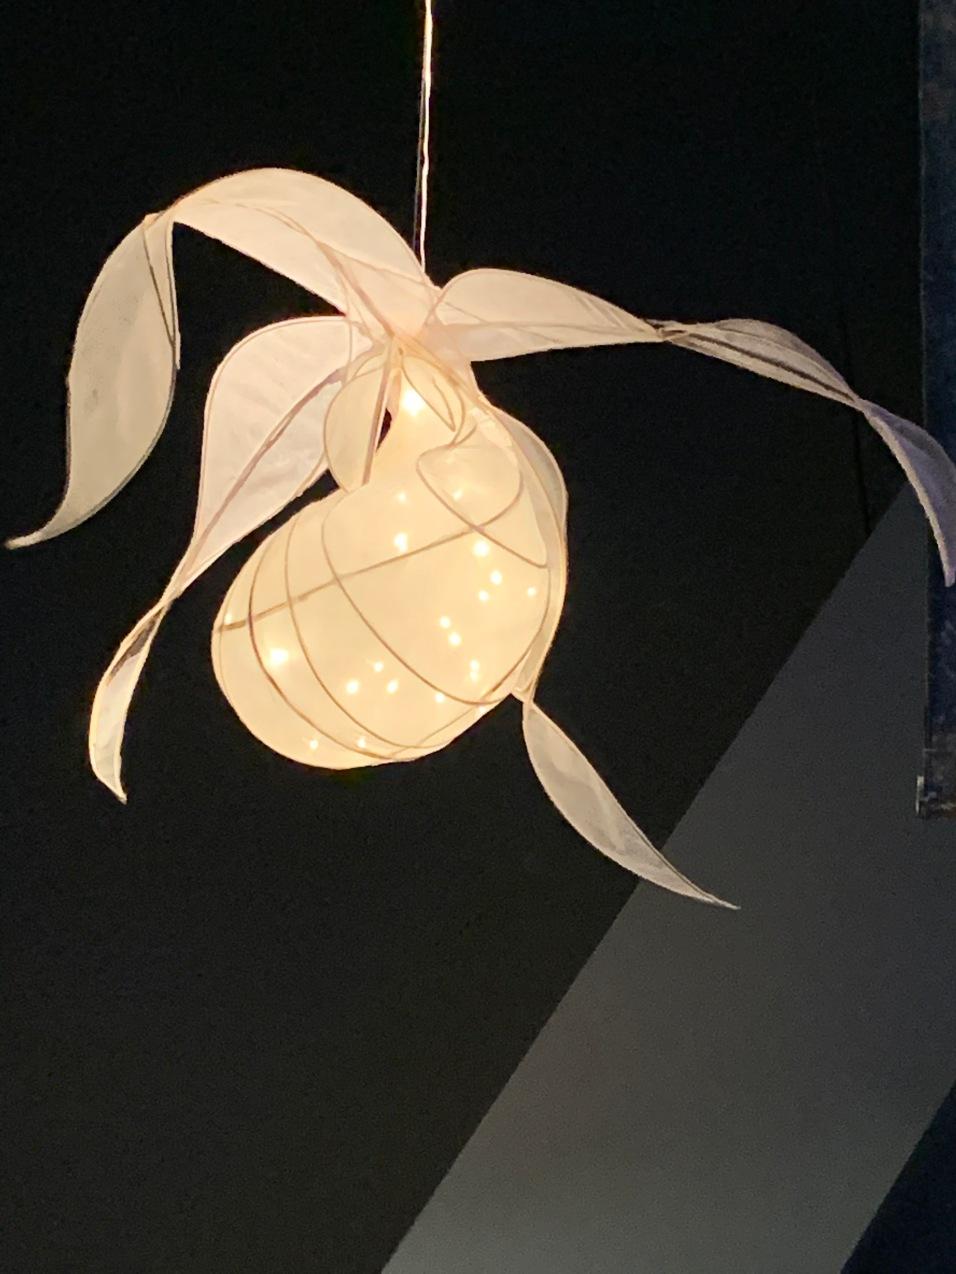 Lit Ladyslipper Lamp